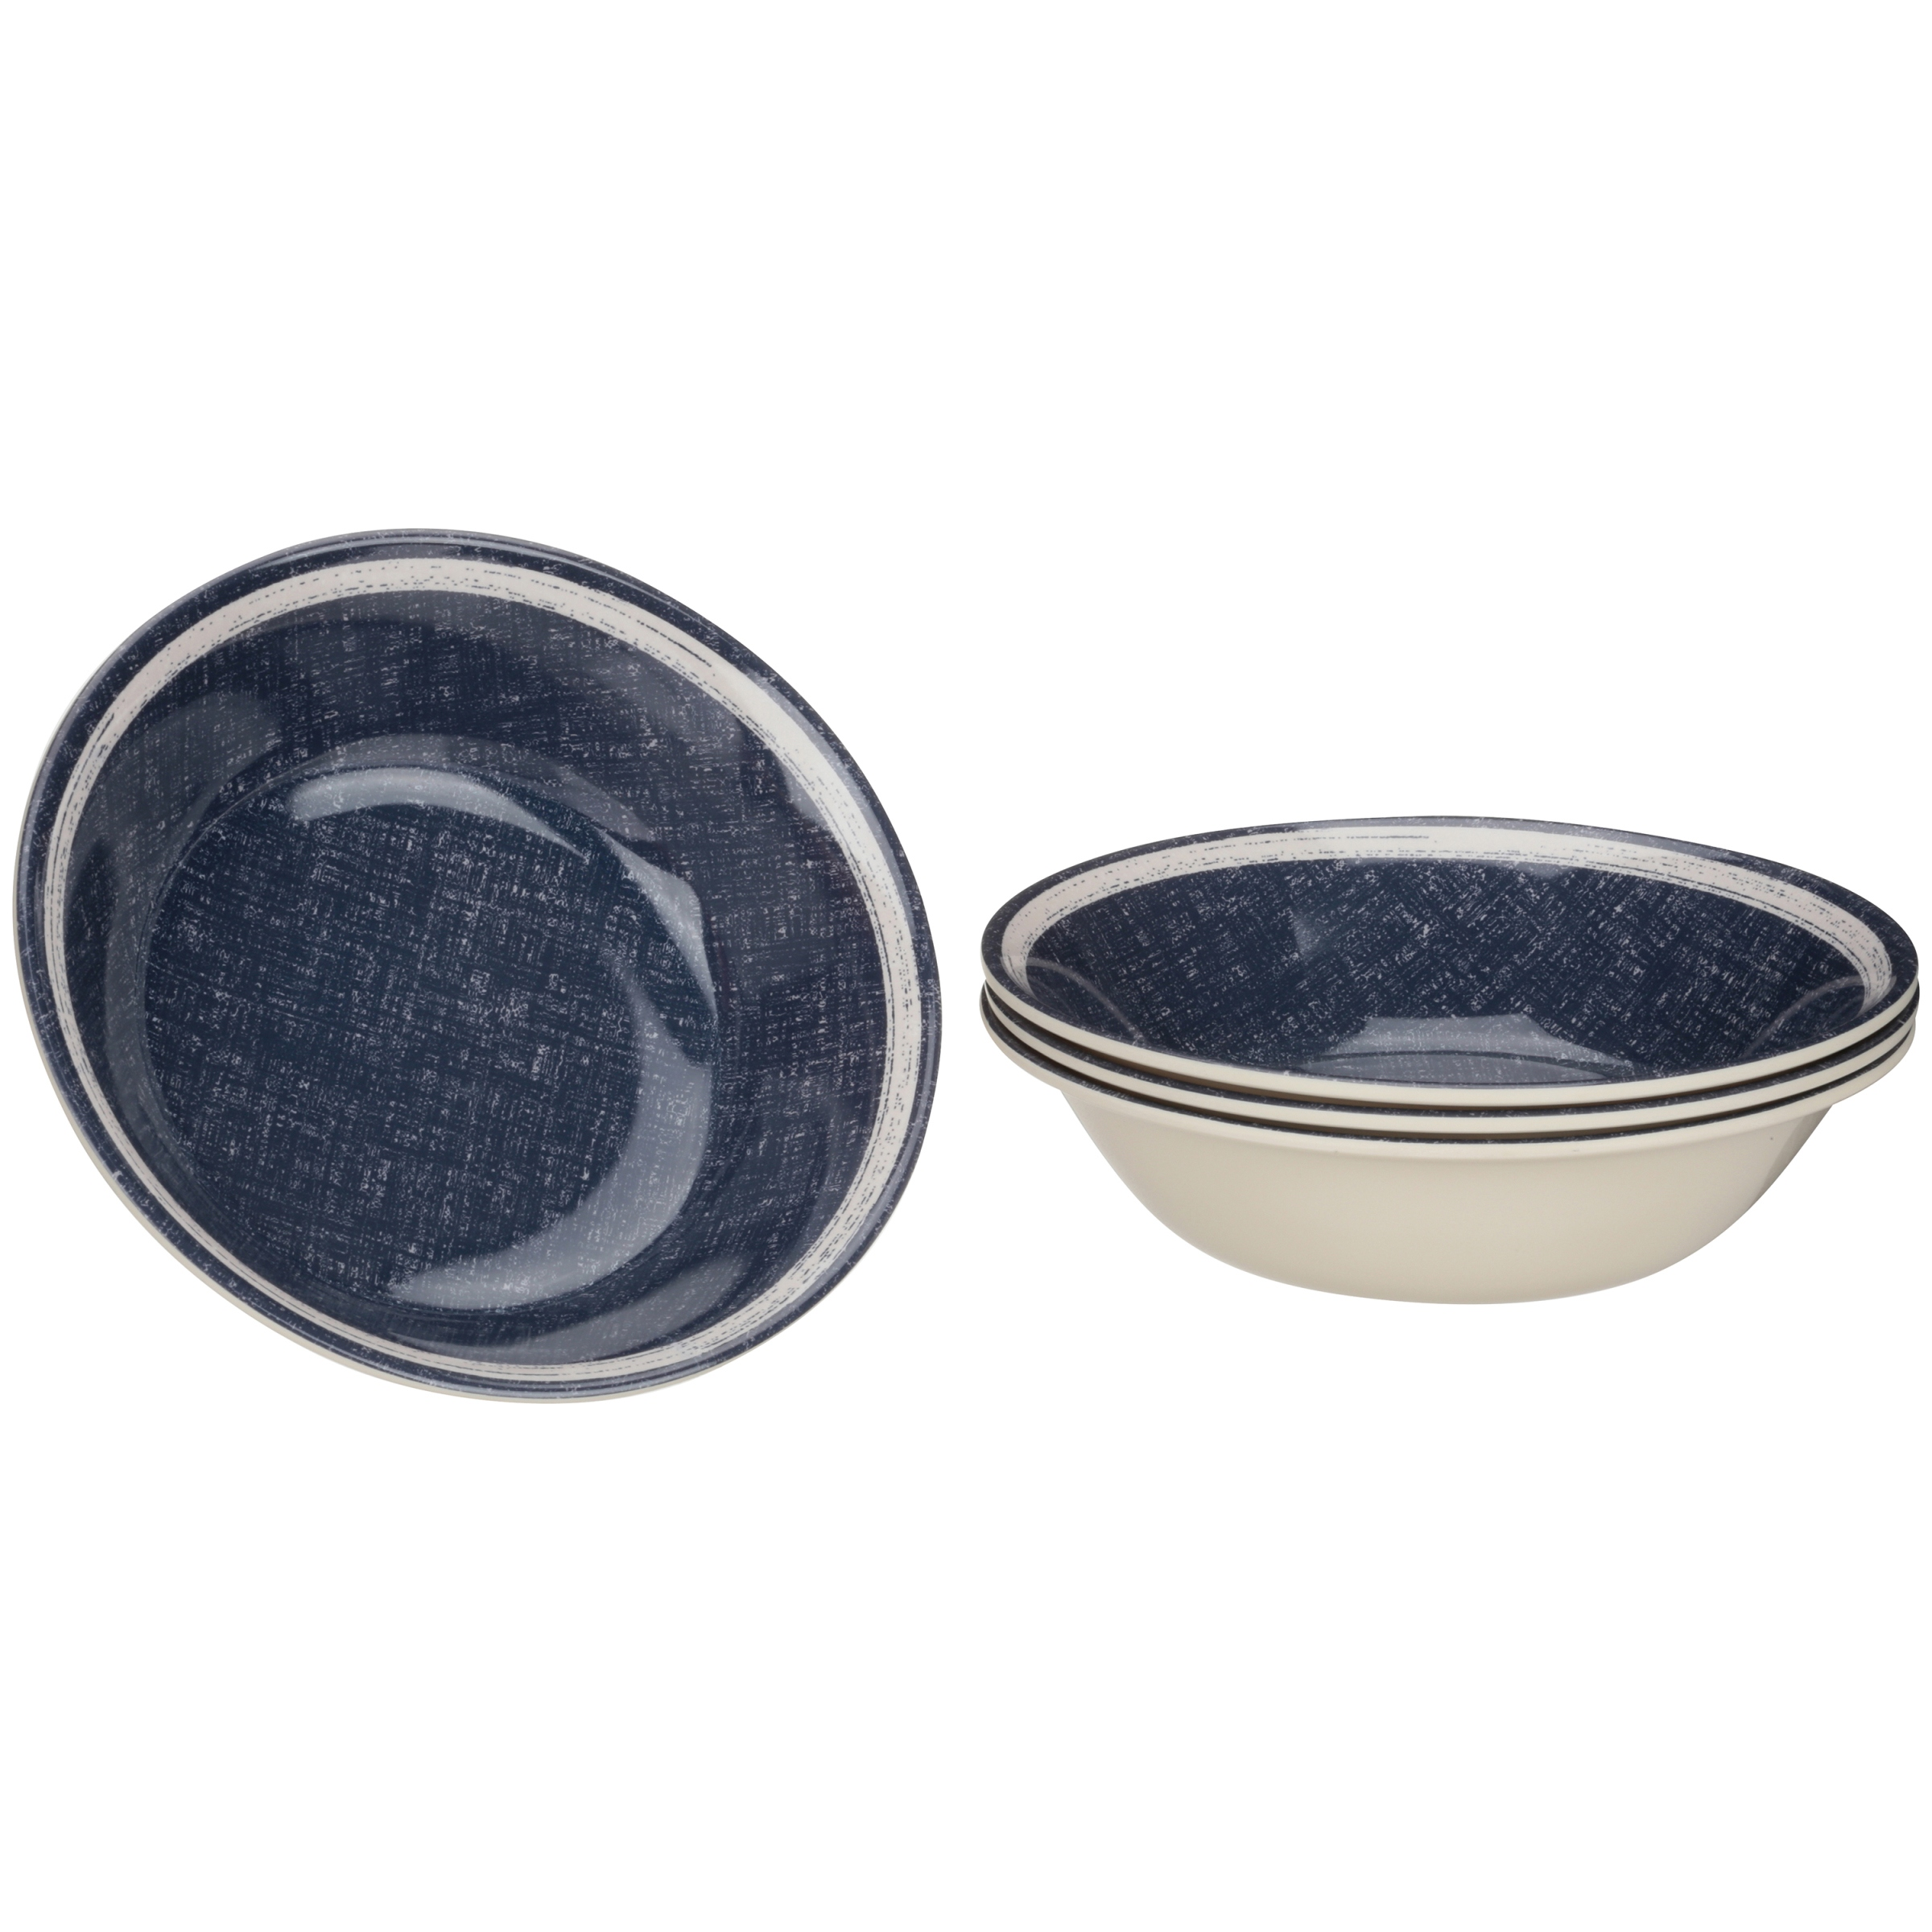 Mainstays Navy Linen Bowl, 4 Pack